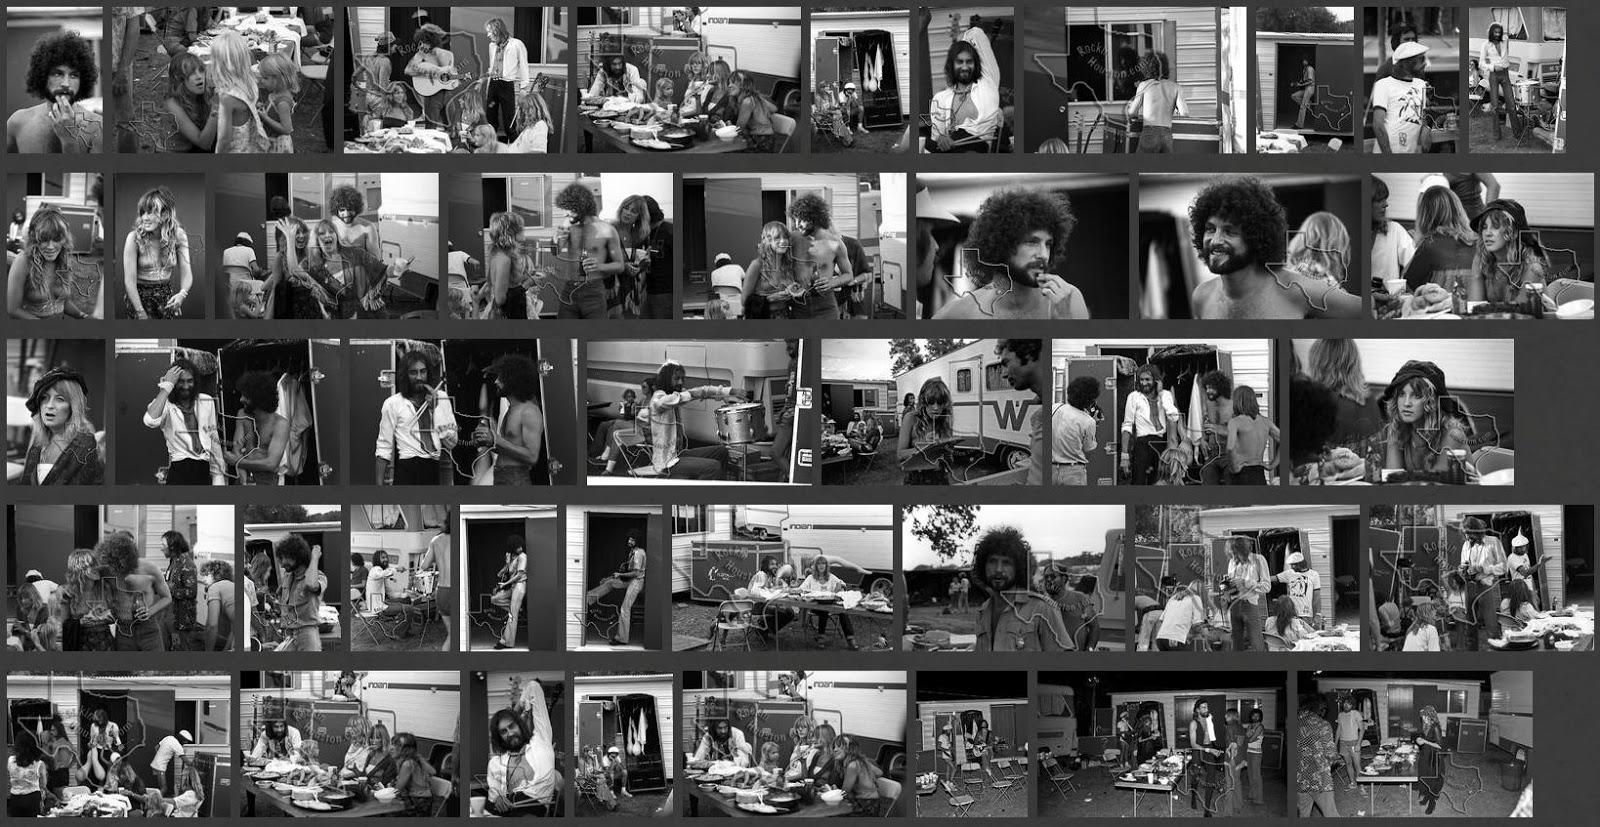 Fleetwood Mac News: Check these photos out! Fleetwood Mac September 5, 1976, Austin, TX at Sunday Break 2